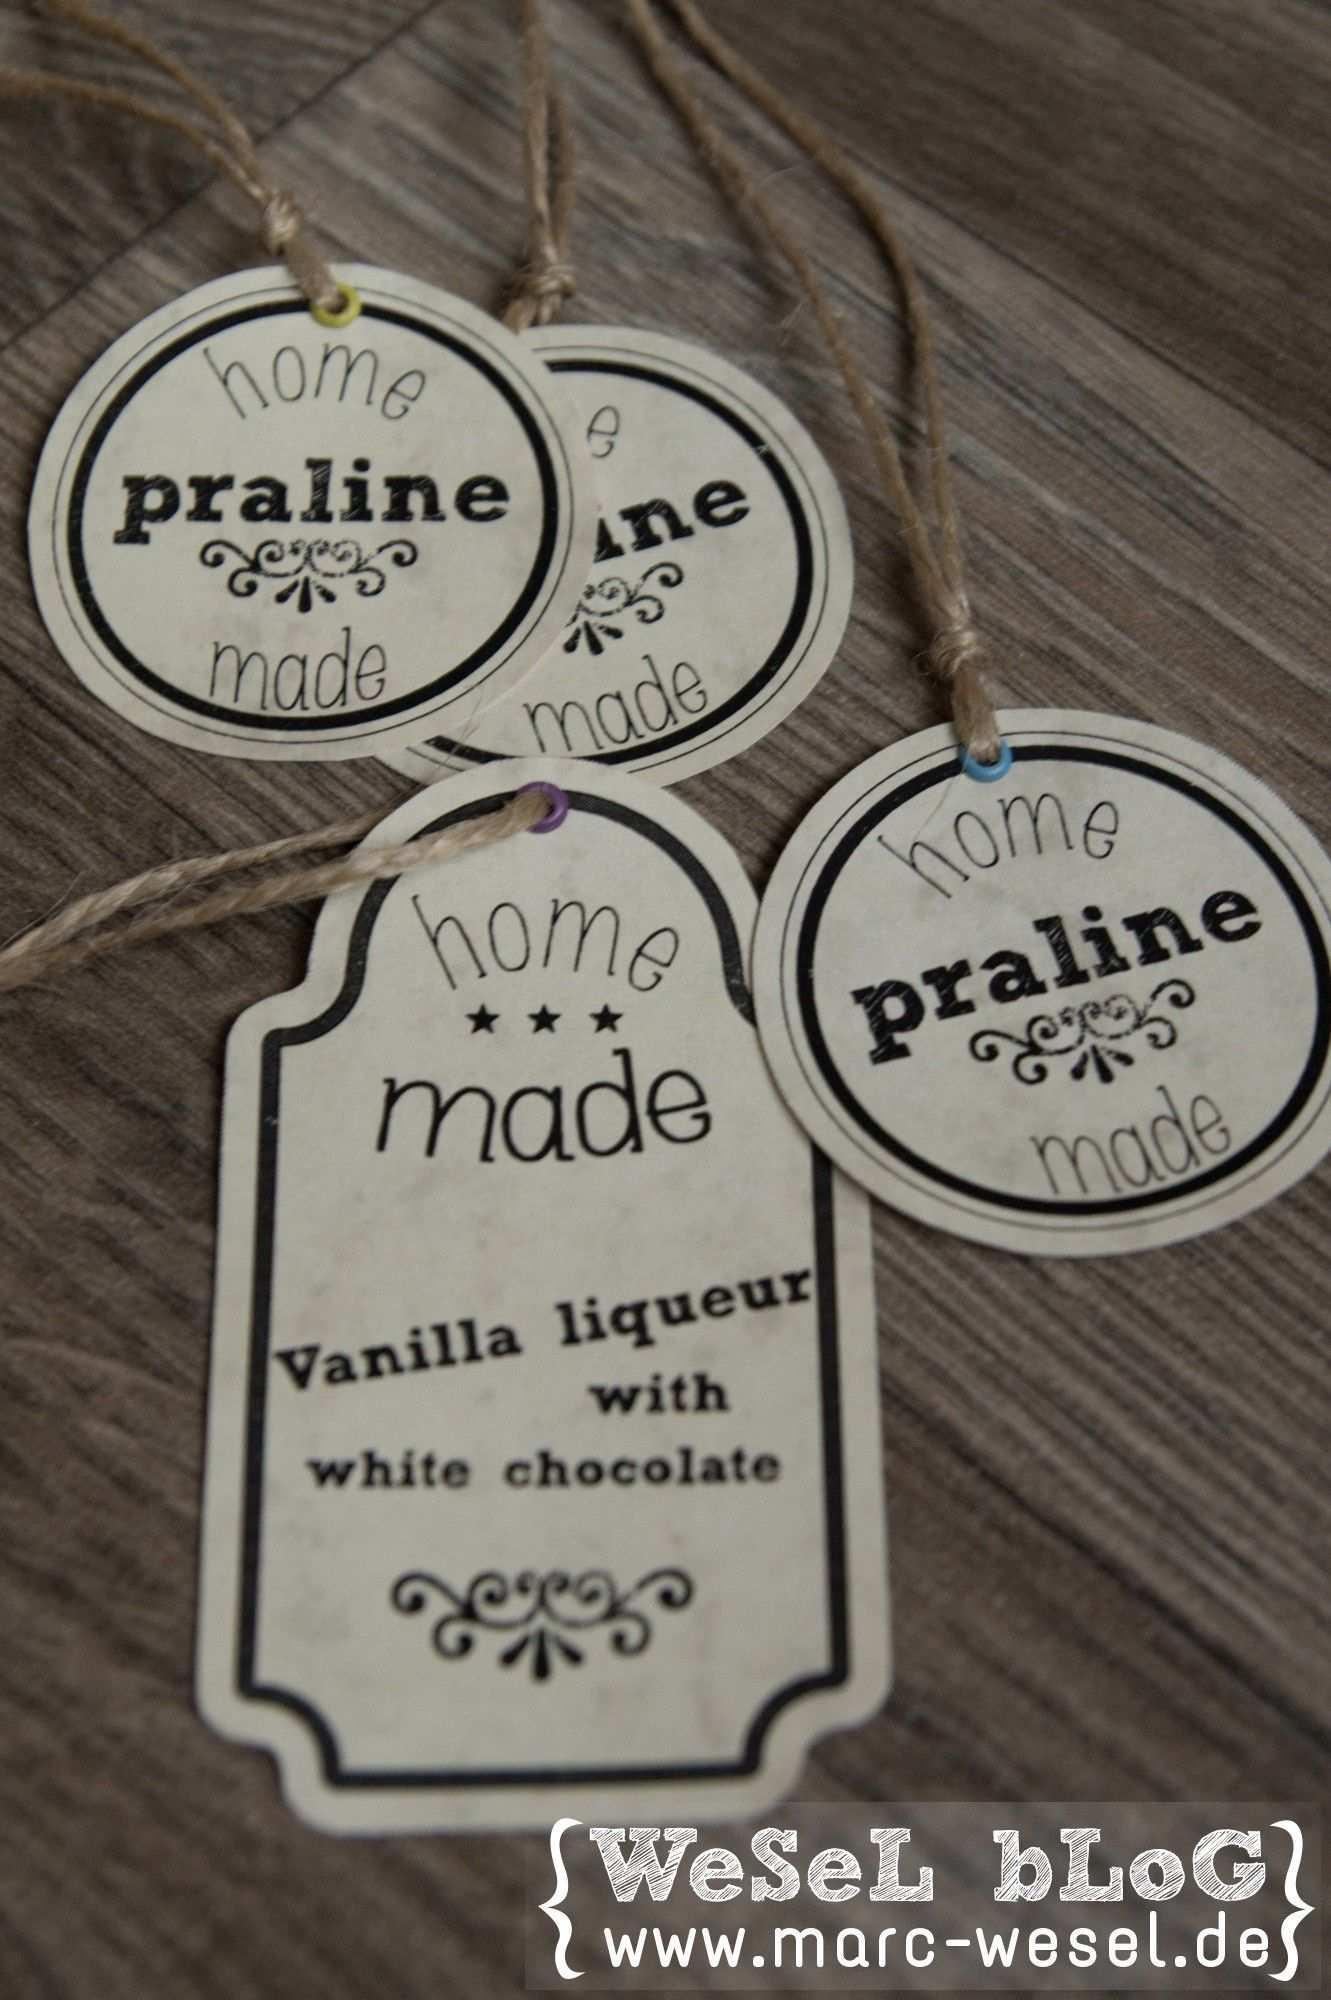 Labels Fur Pralinen Und Likor Diy Wesel Blog Diy Handlettering Plotten Etiketten Vorlagen Etiketten Gestalten Etiketten Vorlagen Kostenlos